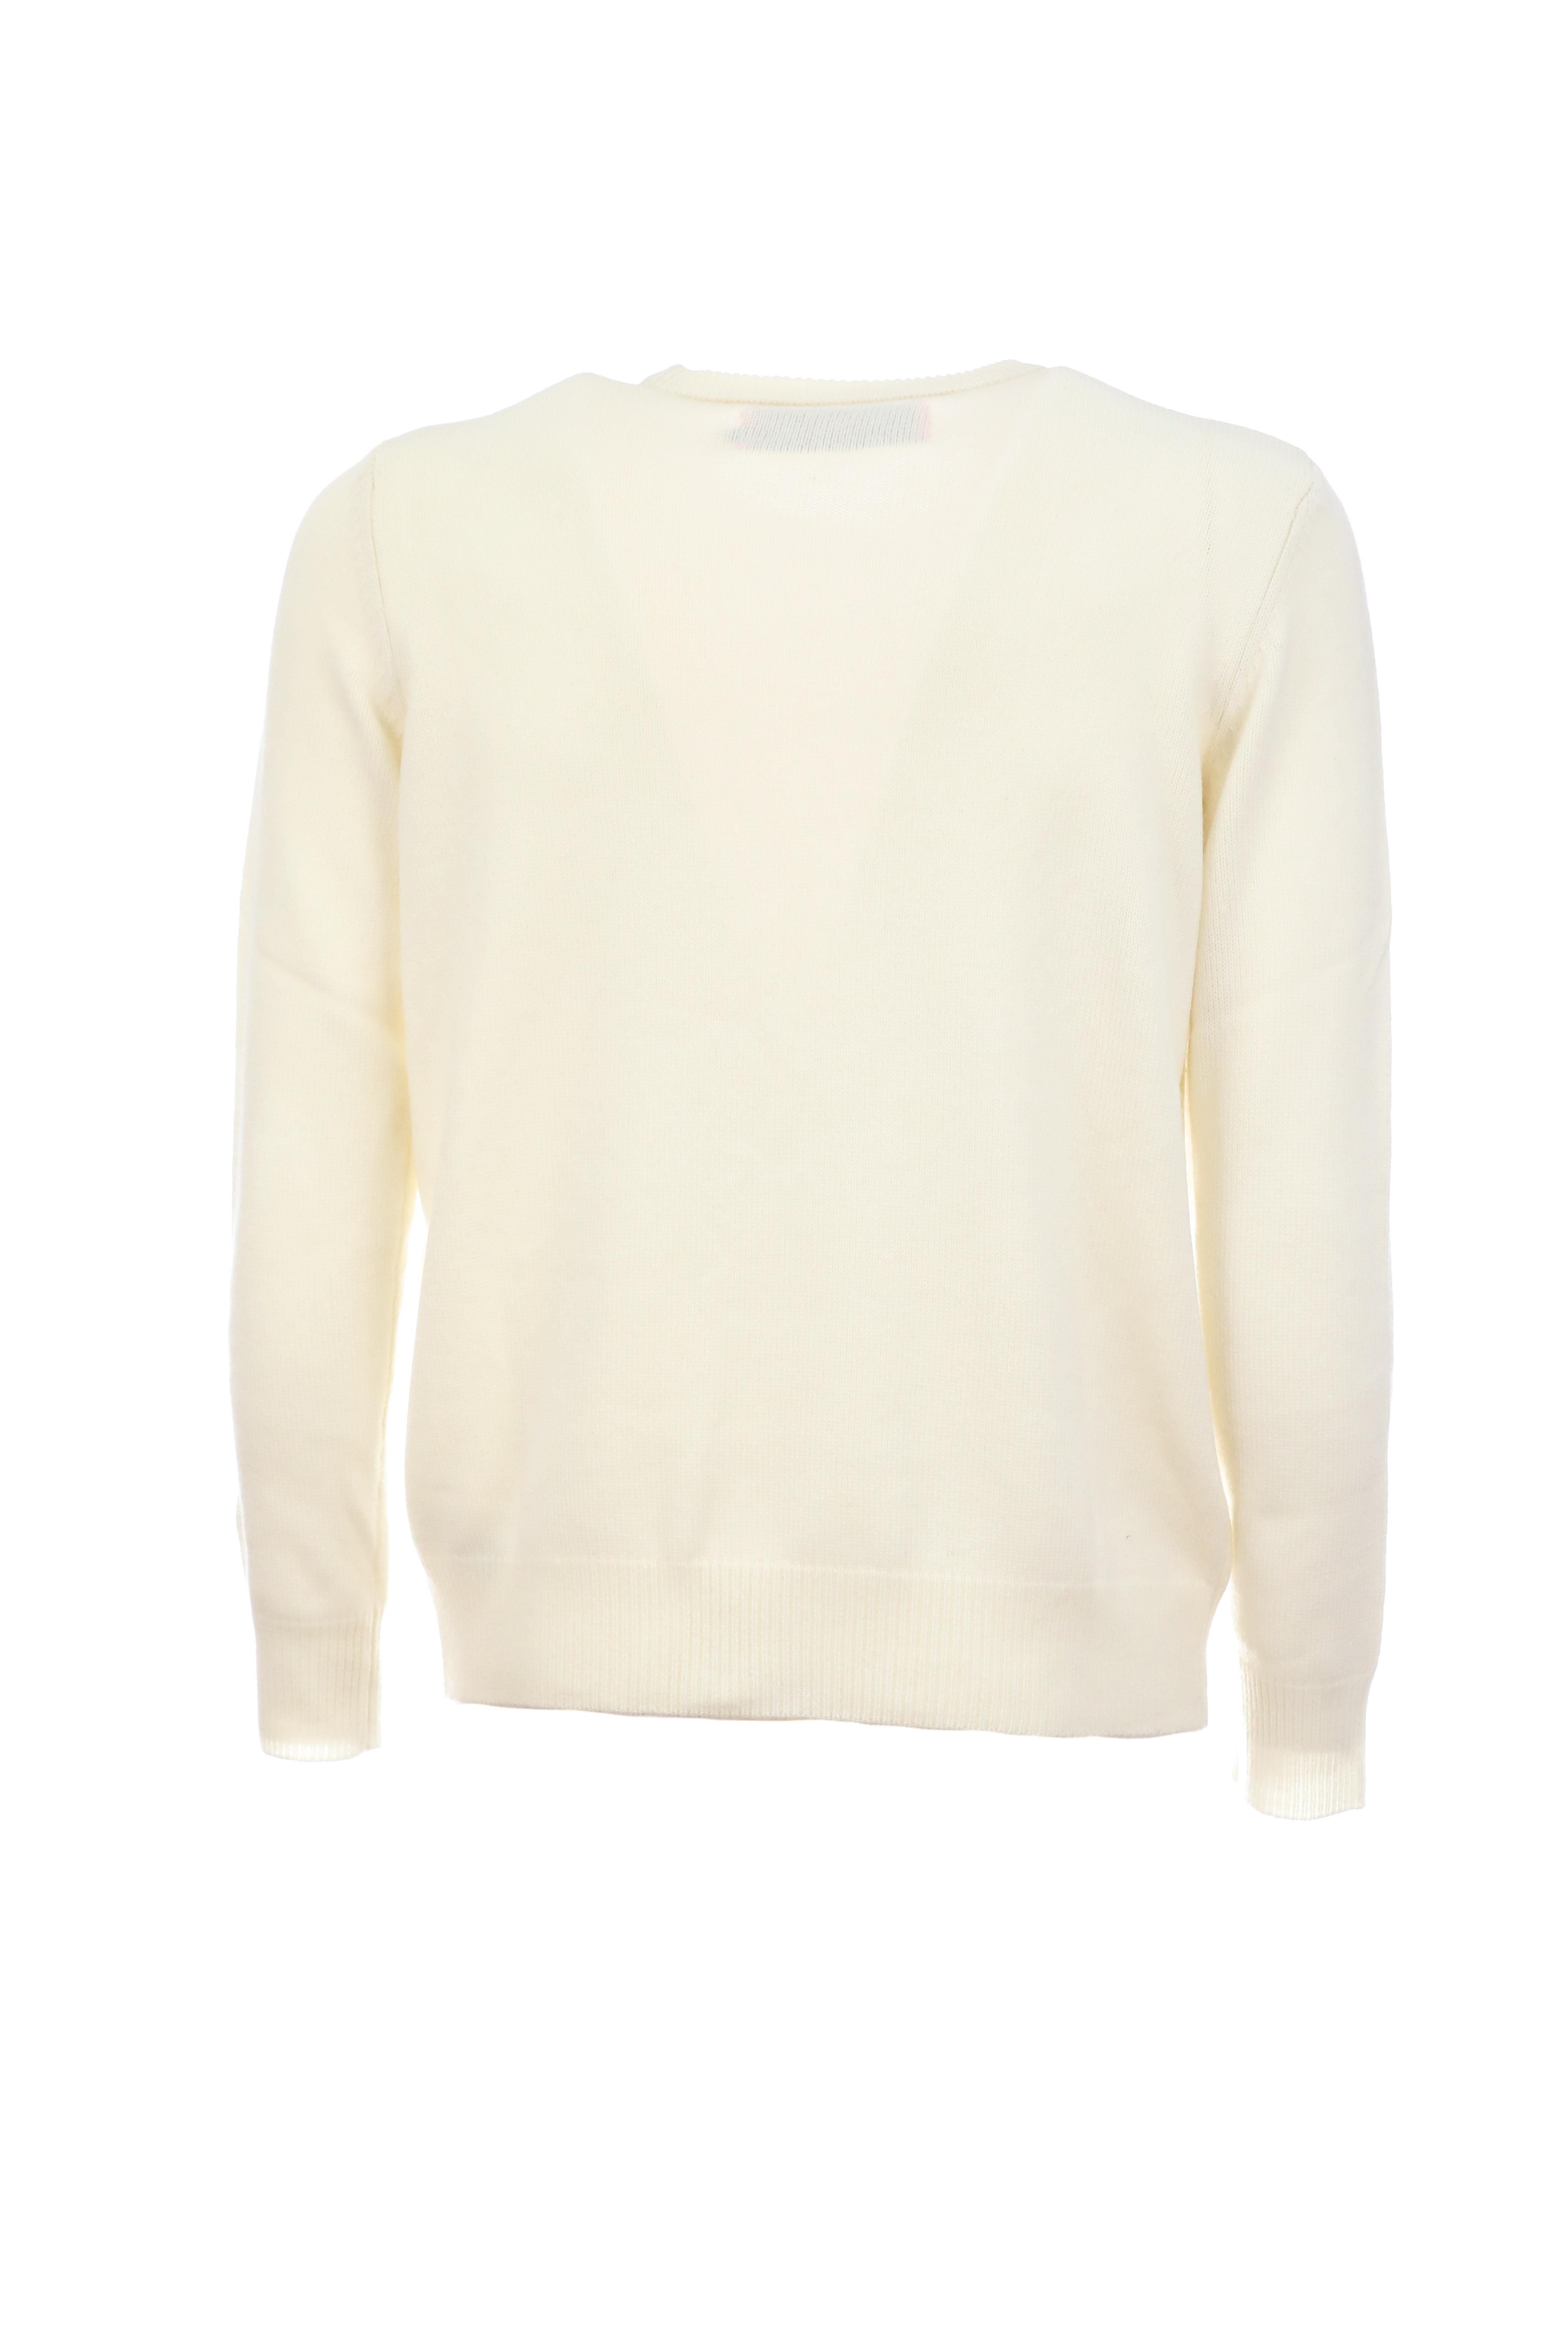 MC2  SAINT BARTH | Knitwear | QUEENEMPF04